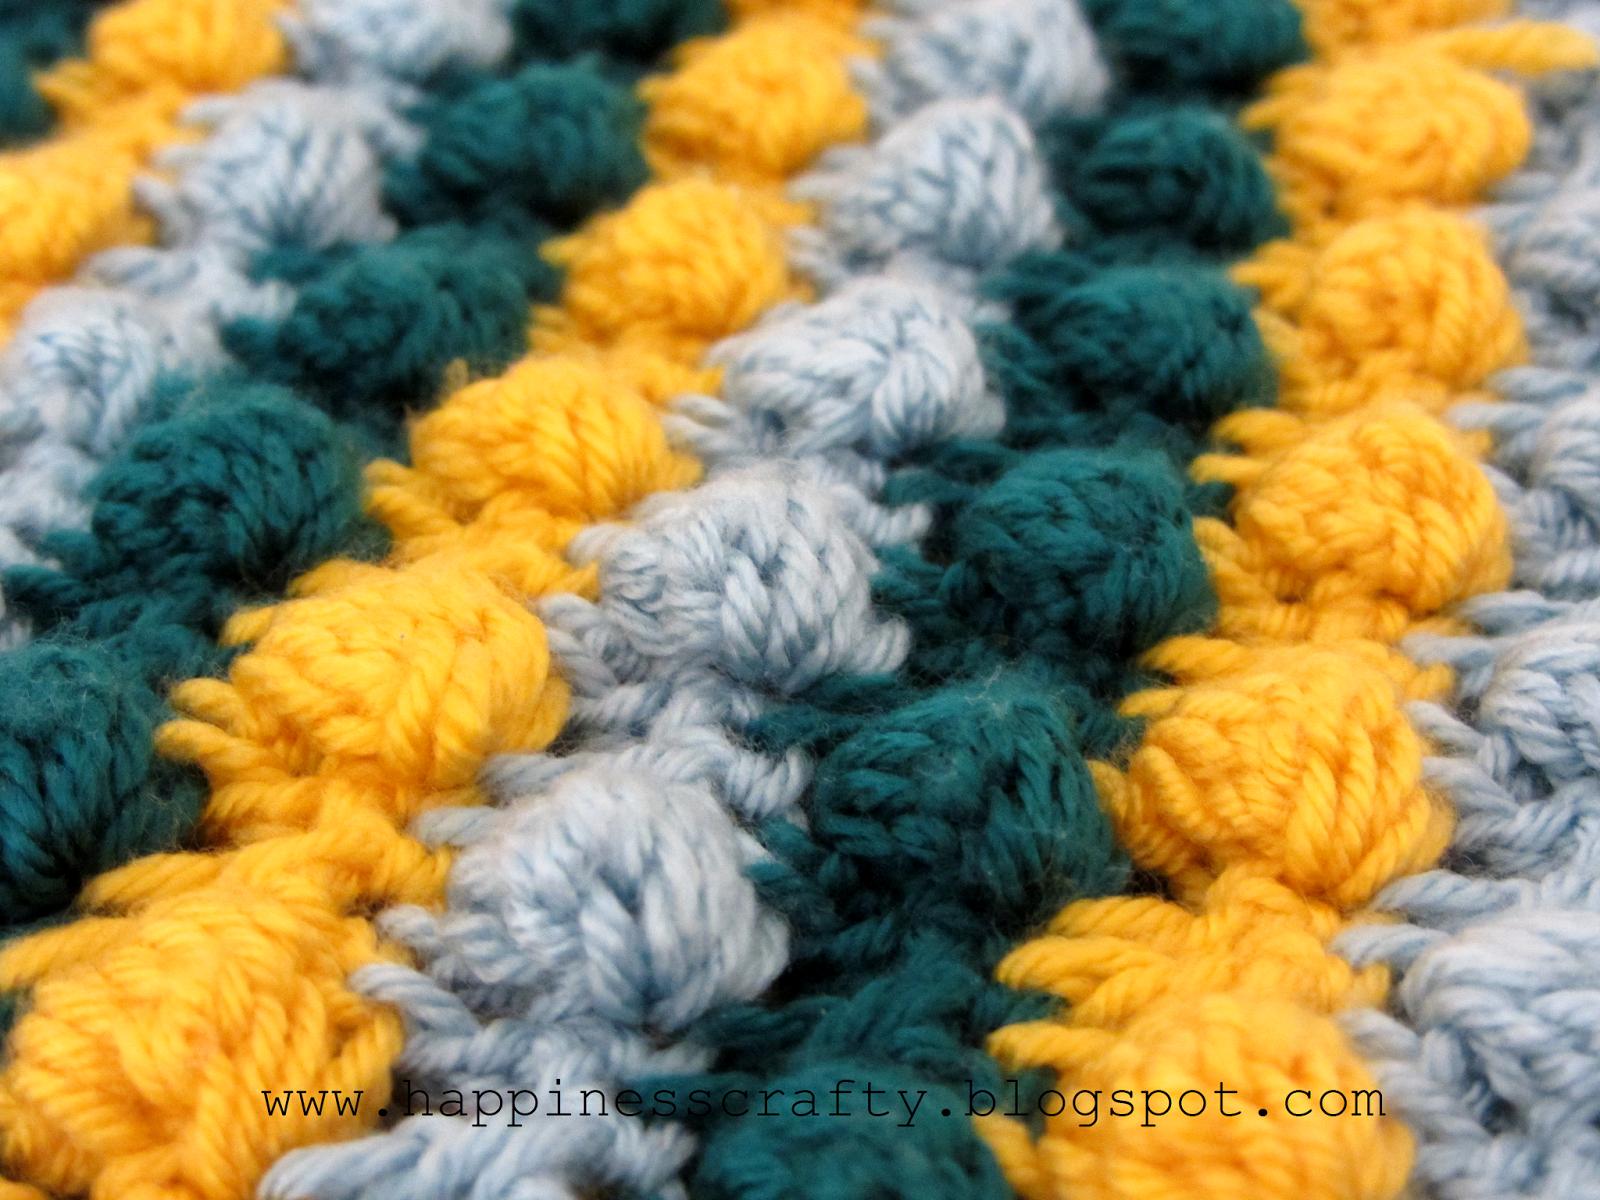 Happiness crafty crochet baby bobble blanket free pattern happiness crafty crochet baby bobble blanket free pattern bankloansurffo Choice Image